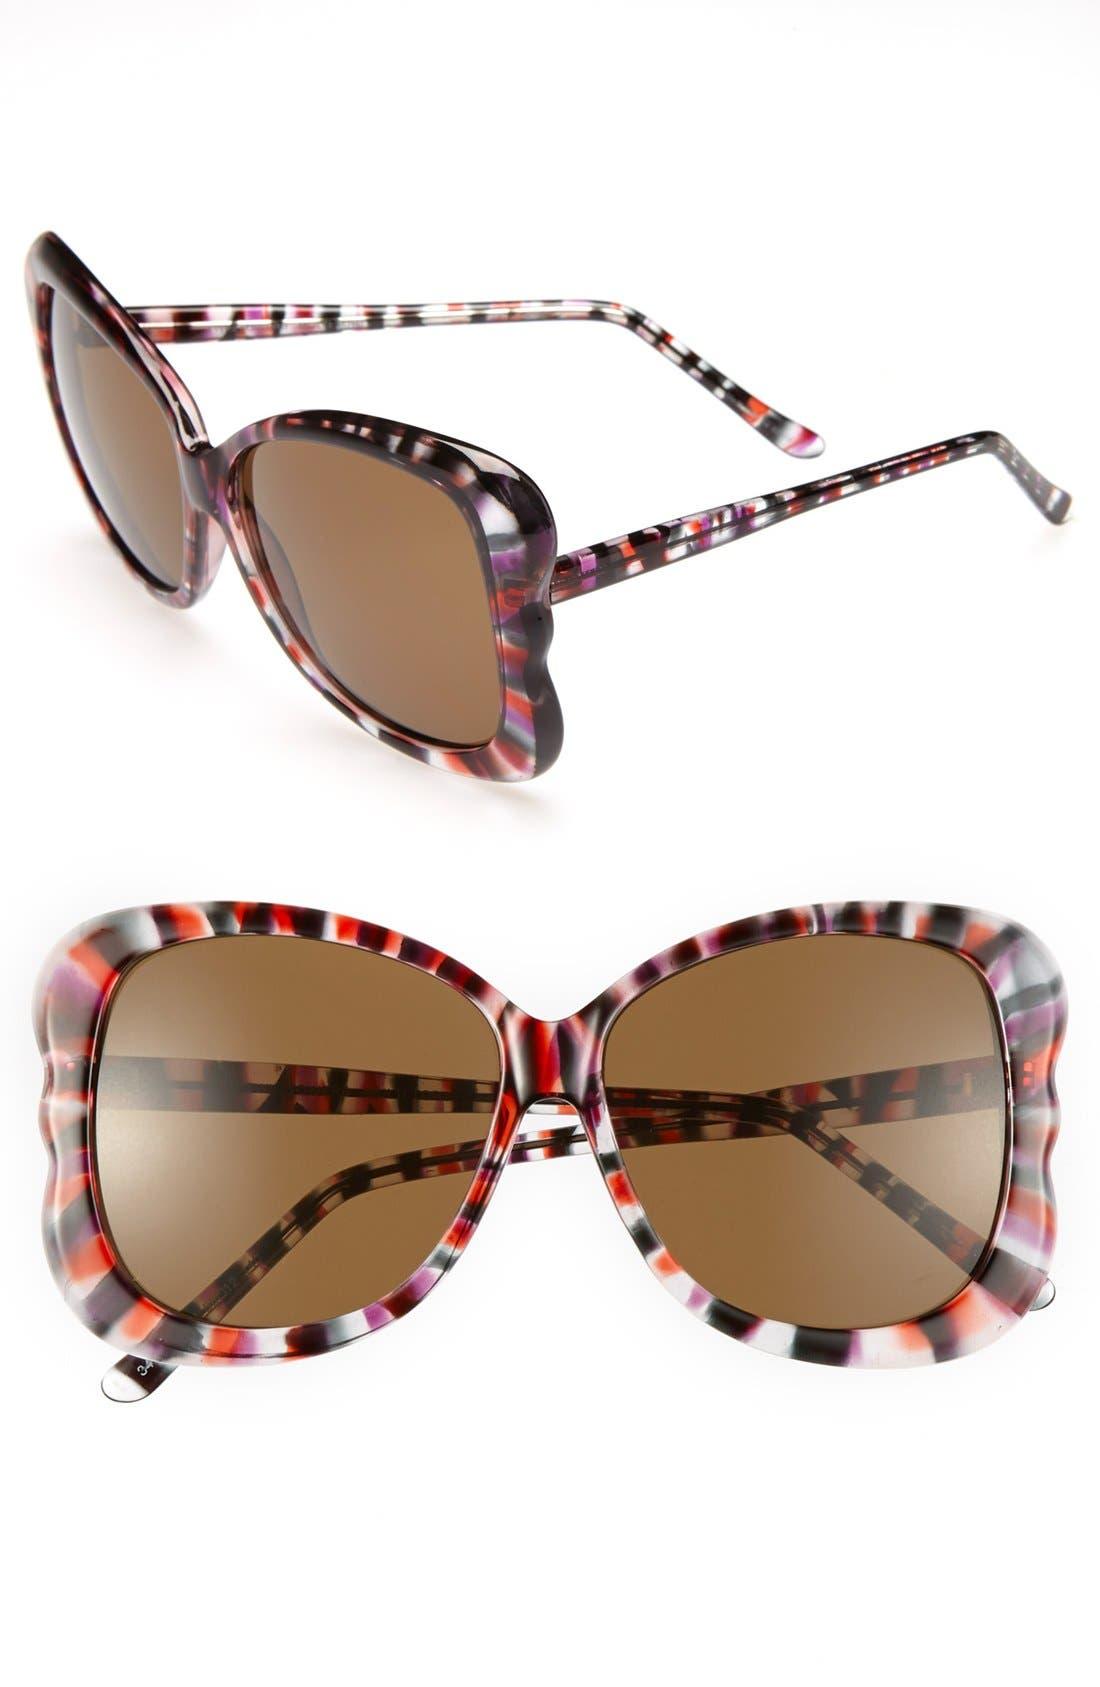 Main Image - Outlook Eyewear 'Towers' 56mm Sunglasses